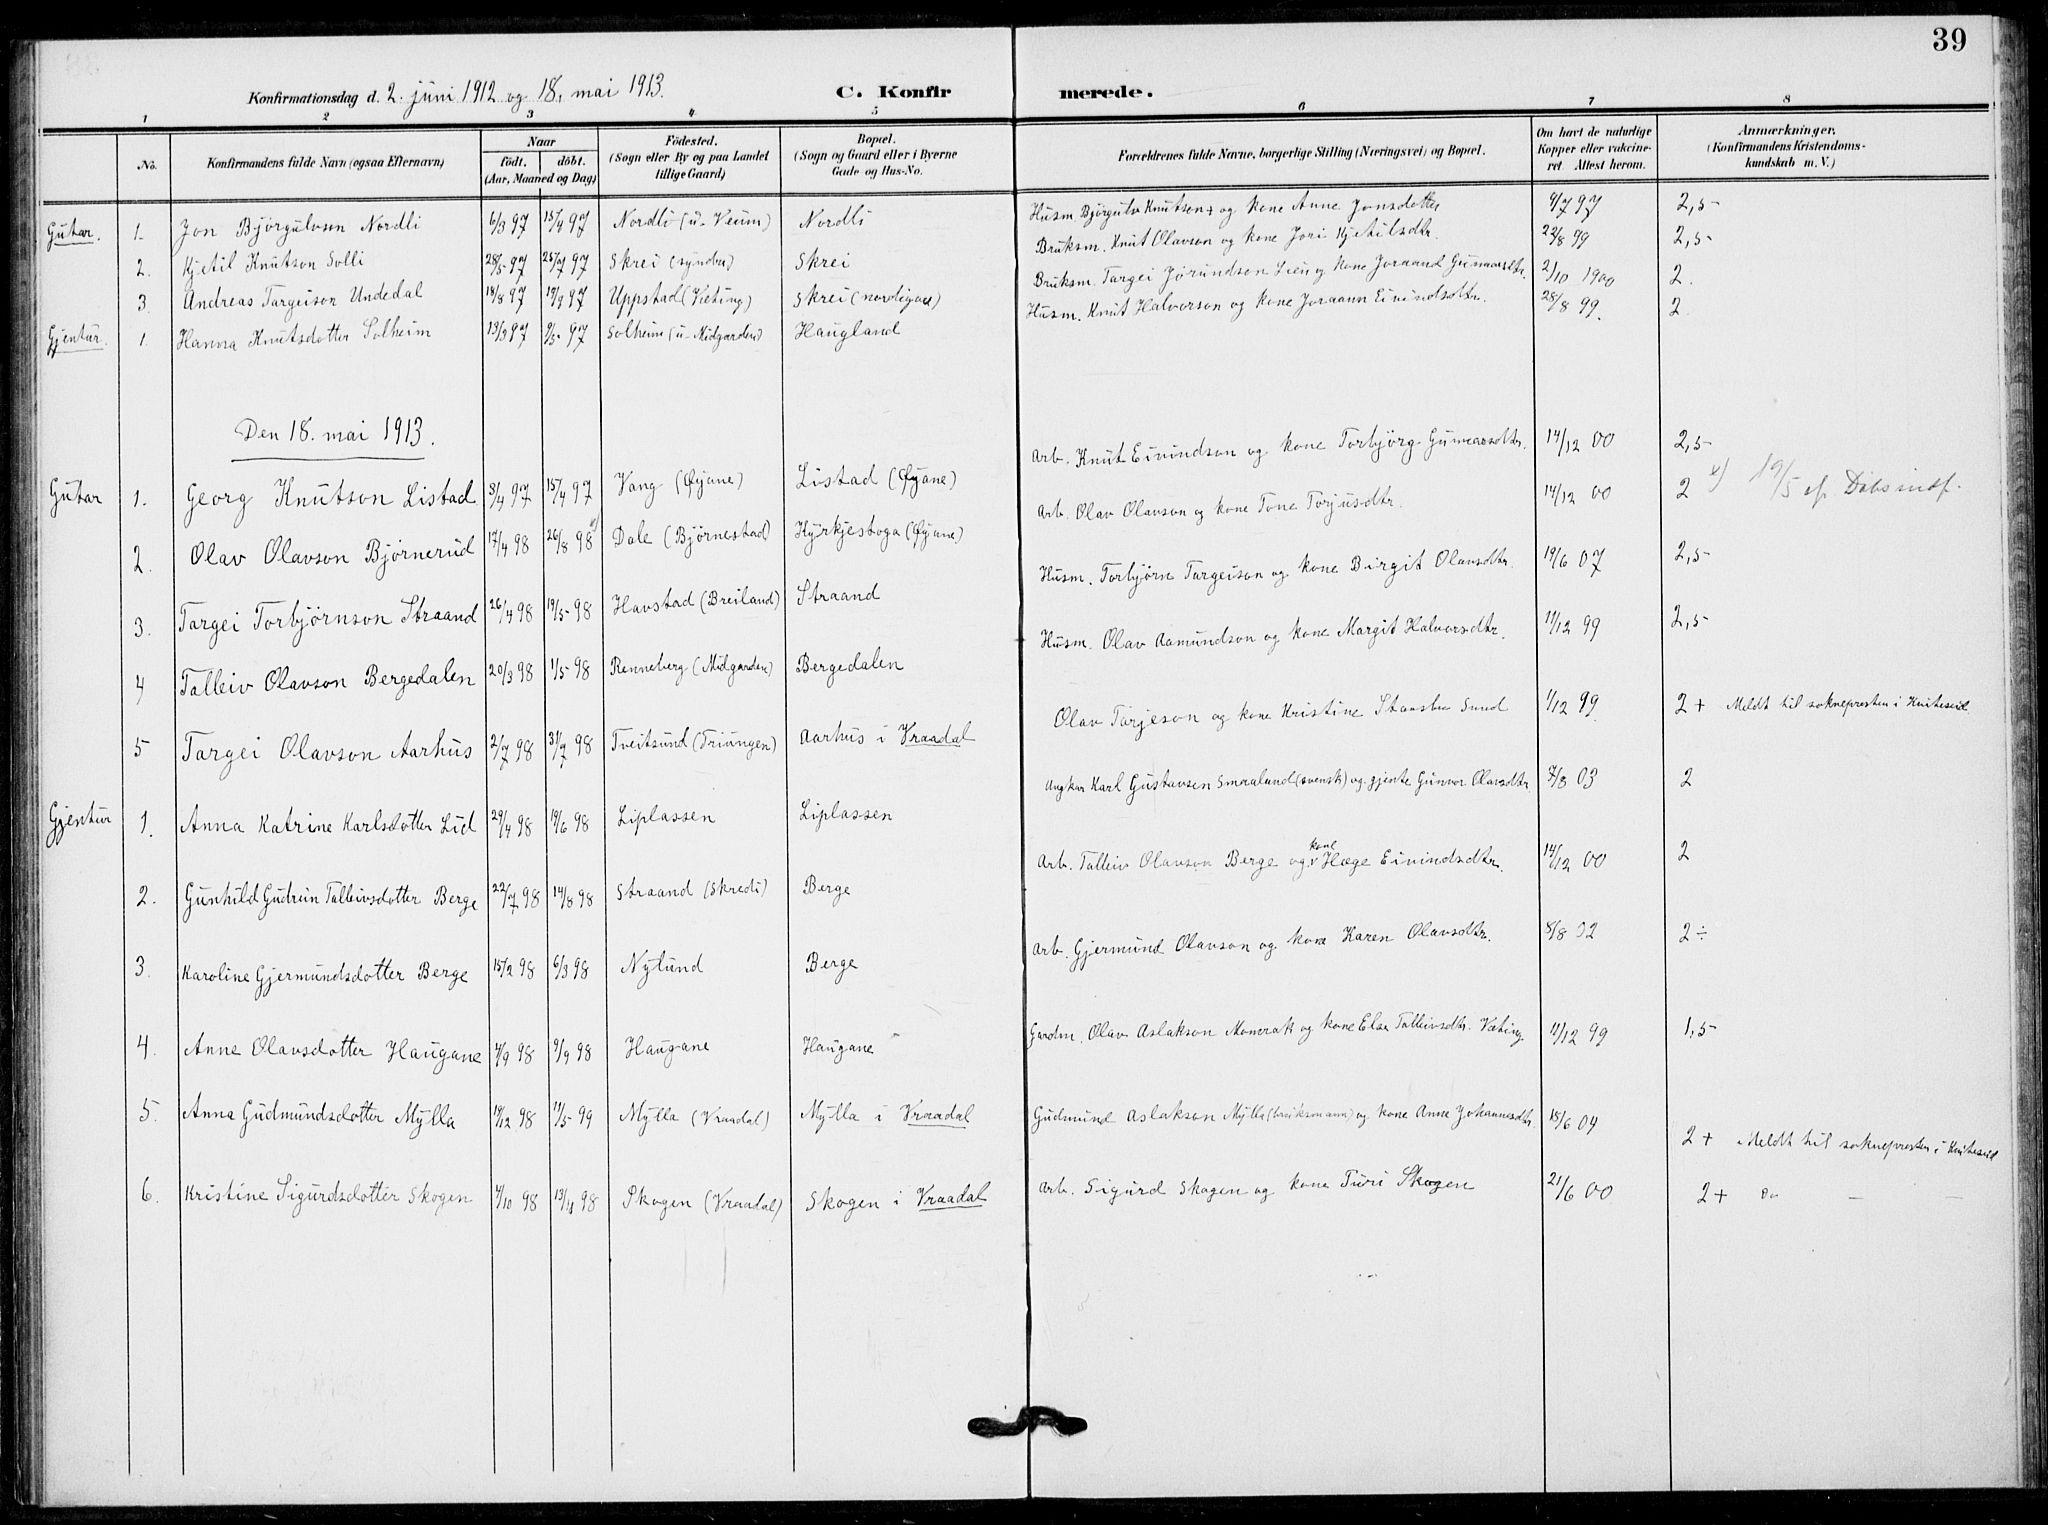 SAKO, Fyresdal kirkebøker, F/Fb/L0004: Ministerialbok nr. II 4, 1903-1920, s. 39